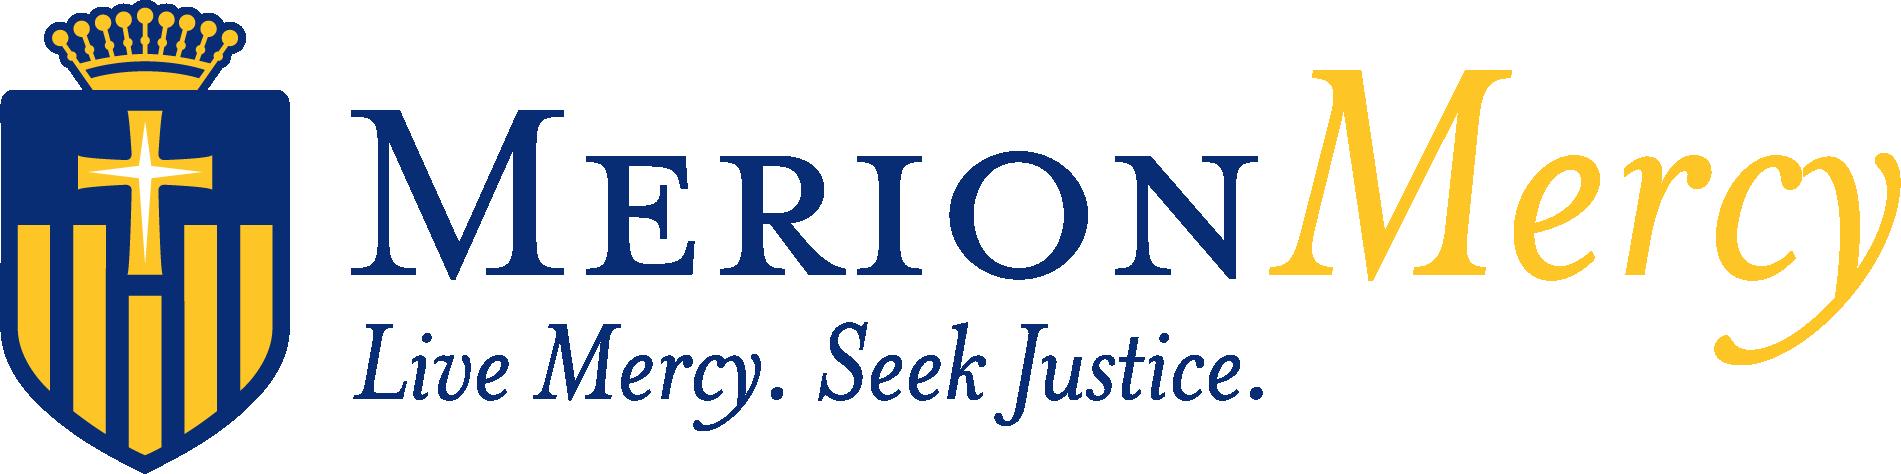 Merion Mercy: Live Mercy. Seek Justice.